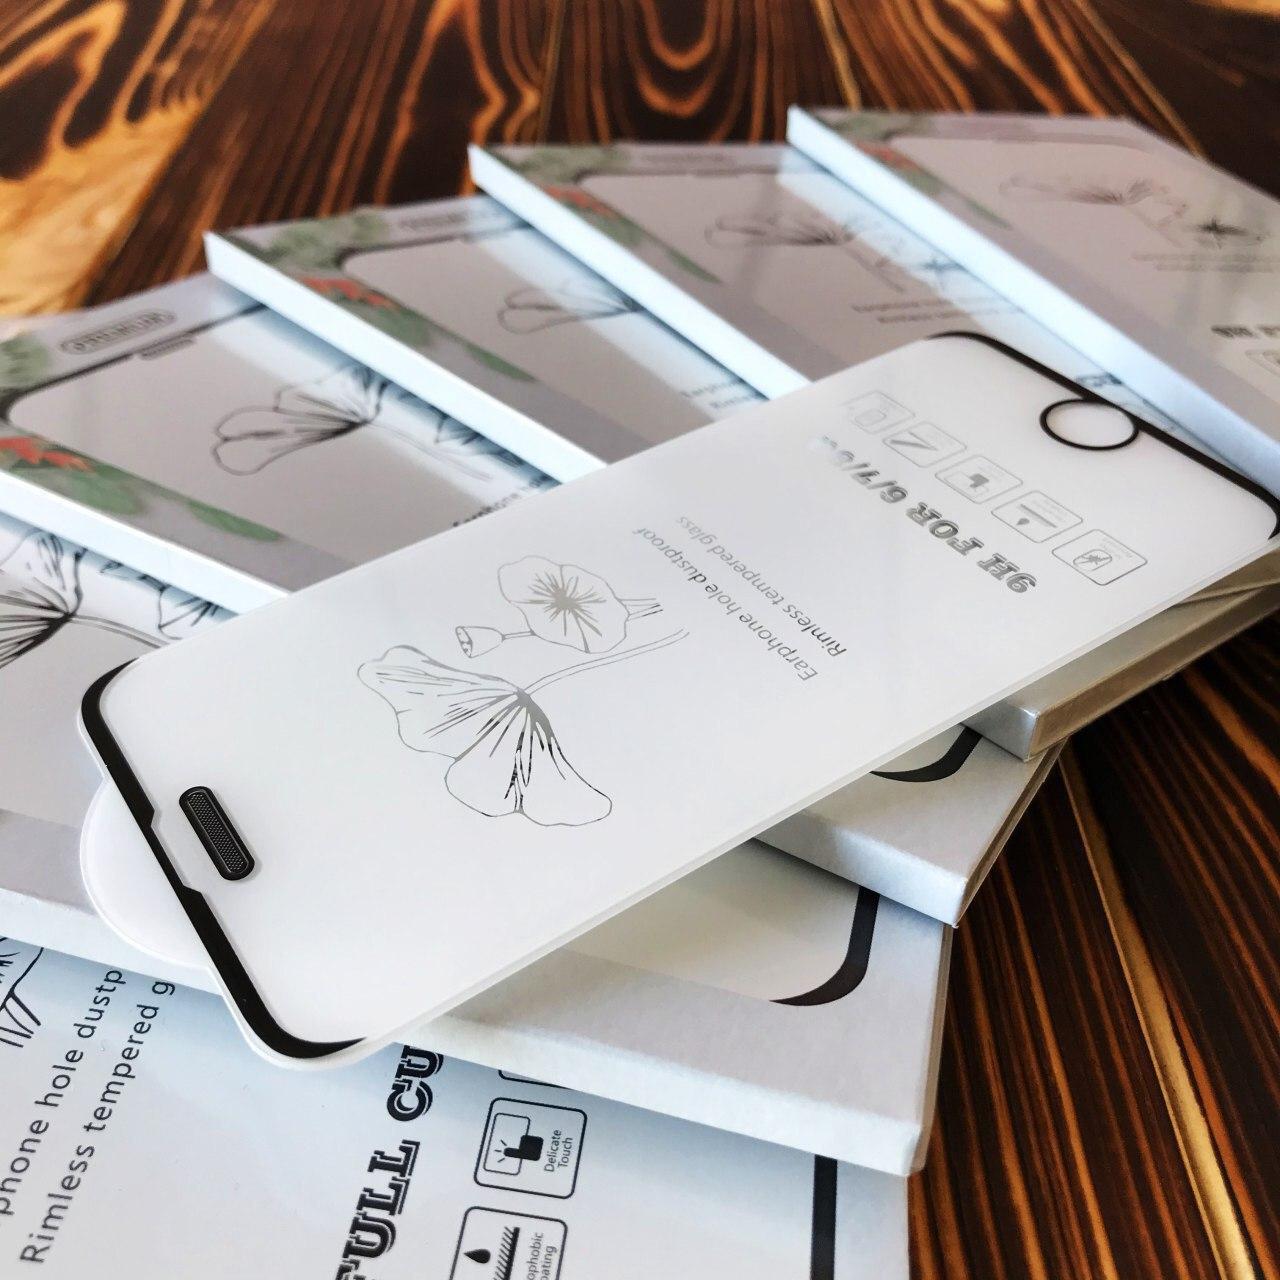 Защитное стекло Rimless glass dustproof для iPhone 6Plus/7Plus/8Plus черное